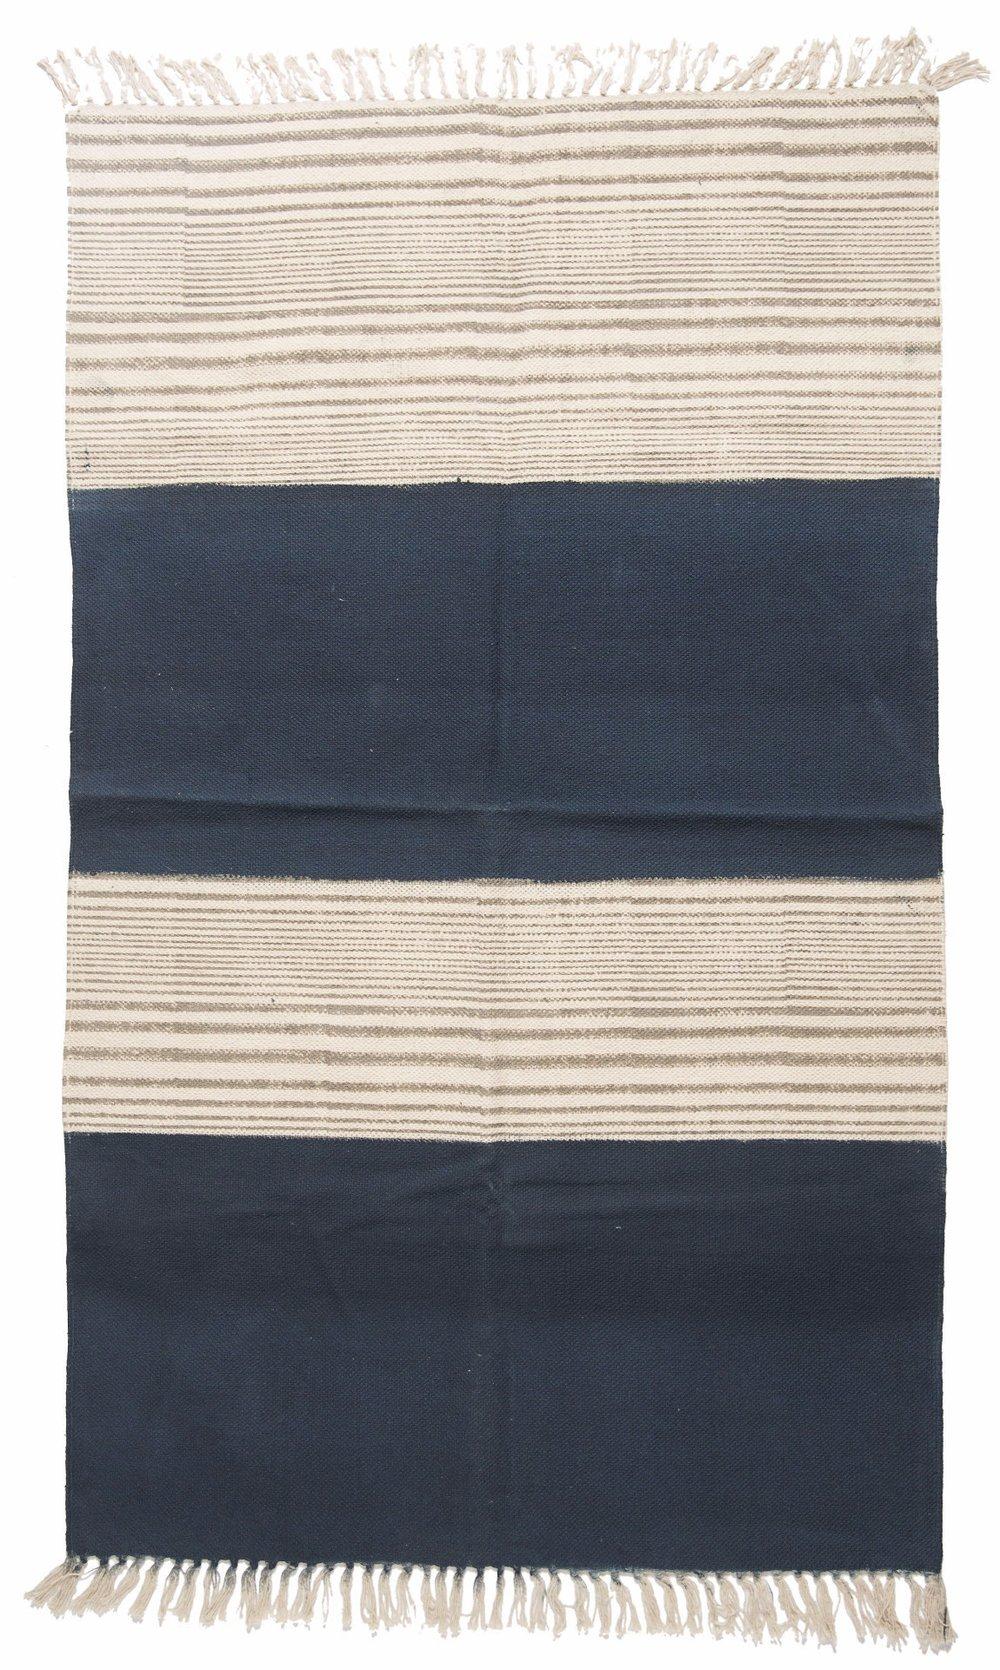 Mahadevi Block Hand Painted Cotton Rug